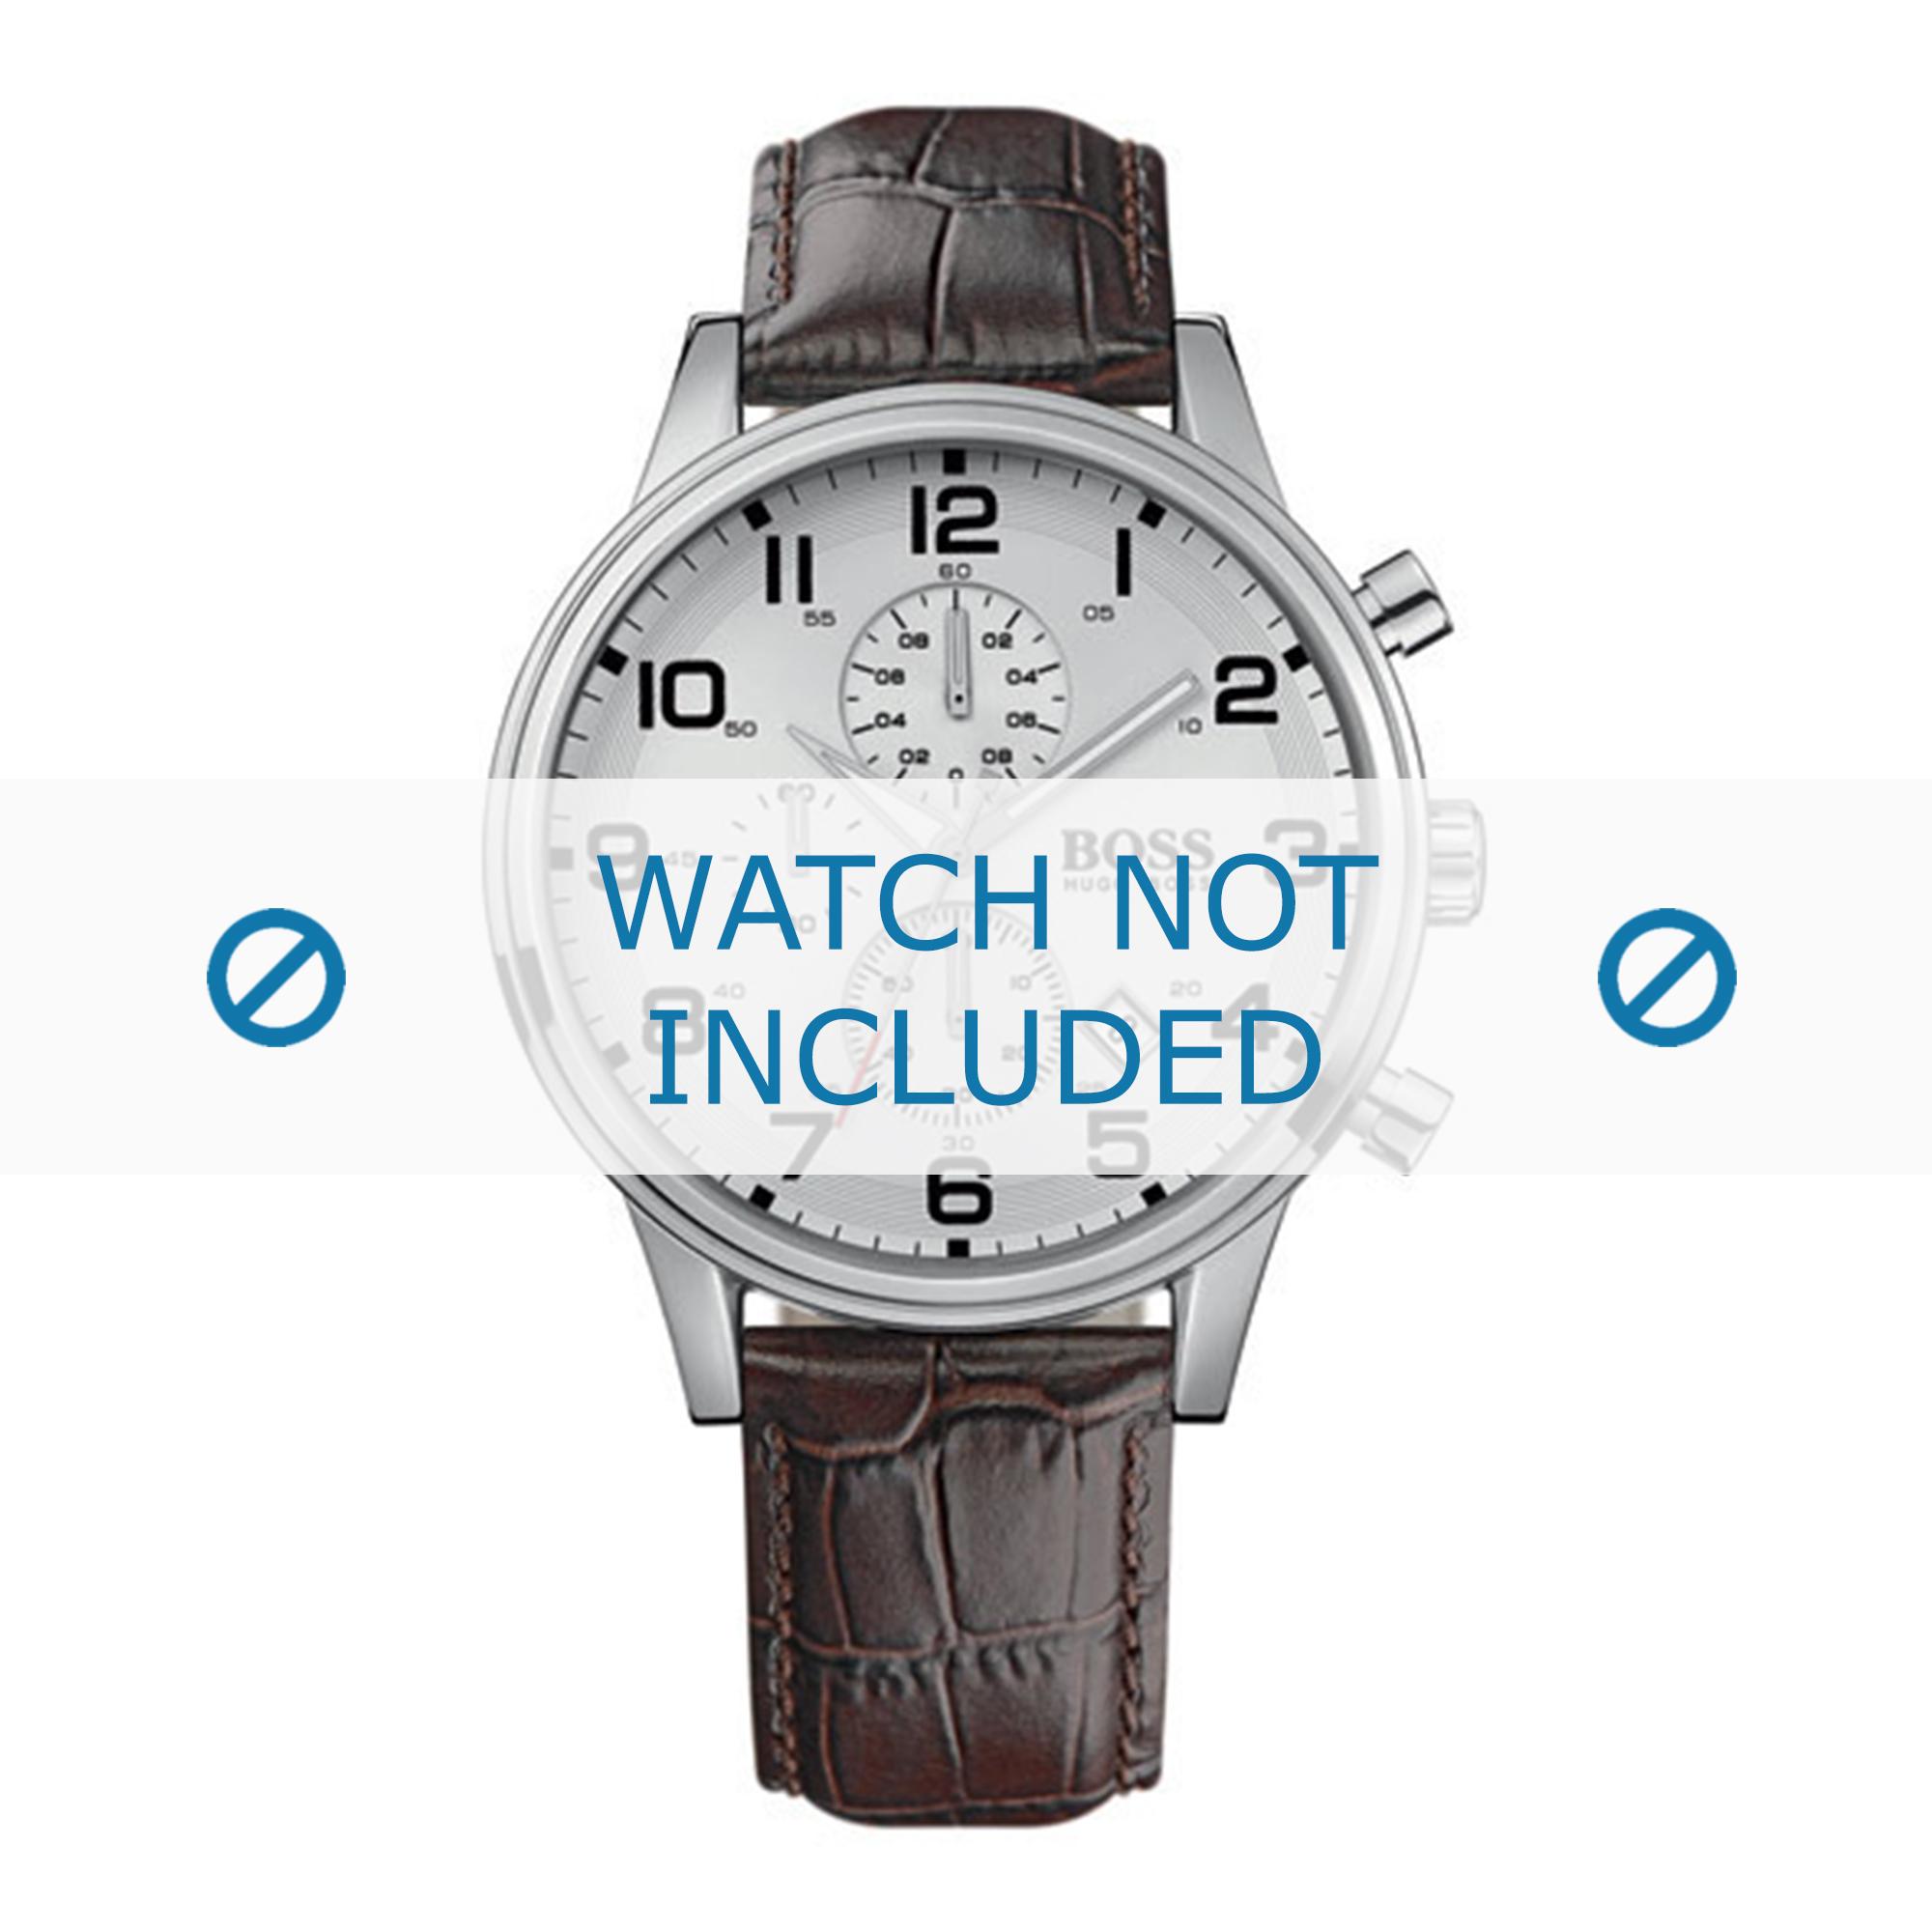 Hugo Boss horlogeband HB-88-1-14-2194-HB1512447 Croco leder Bruin 22mm + grijs stiksel